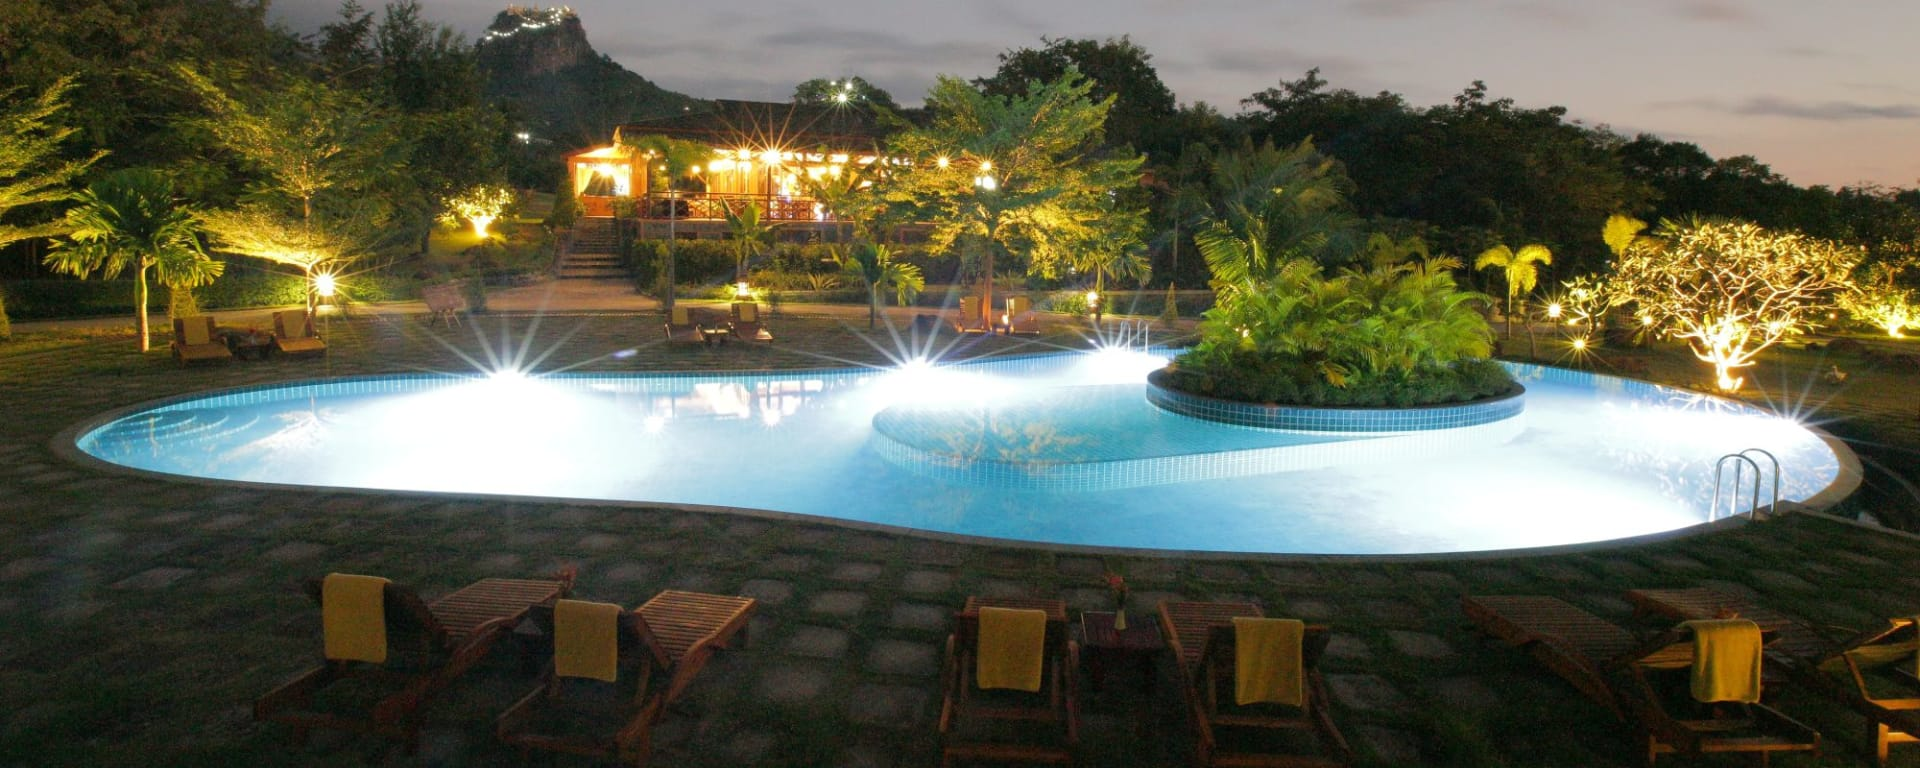 Popa Garden Resort in Bagan: Pool by night